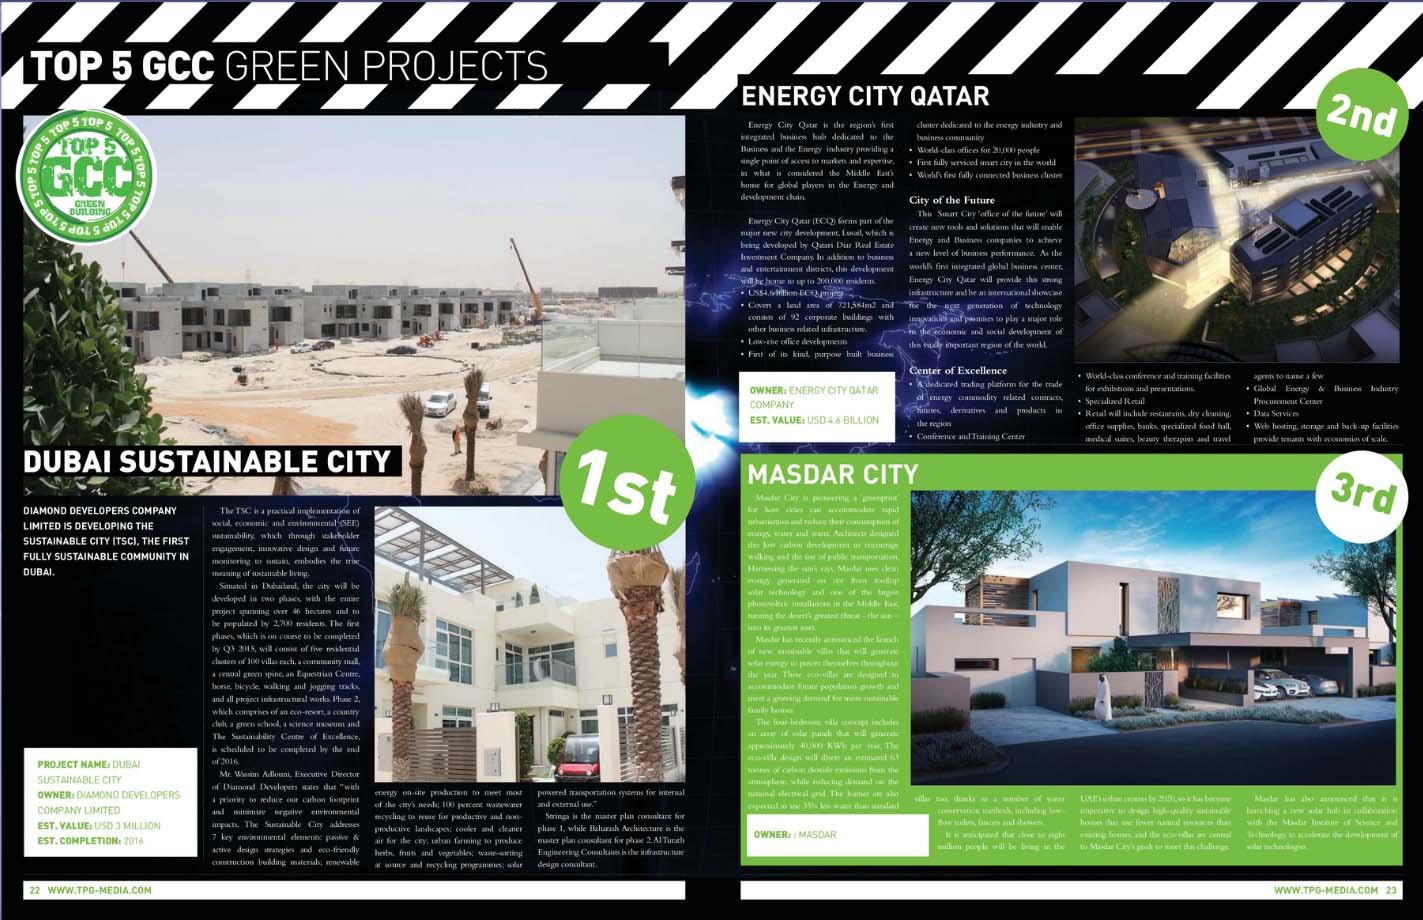 best green projects in gcc dubai sustainable city beats masdar